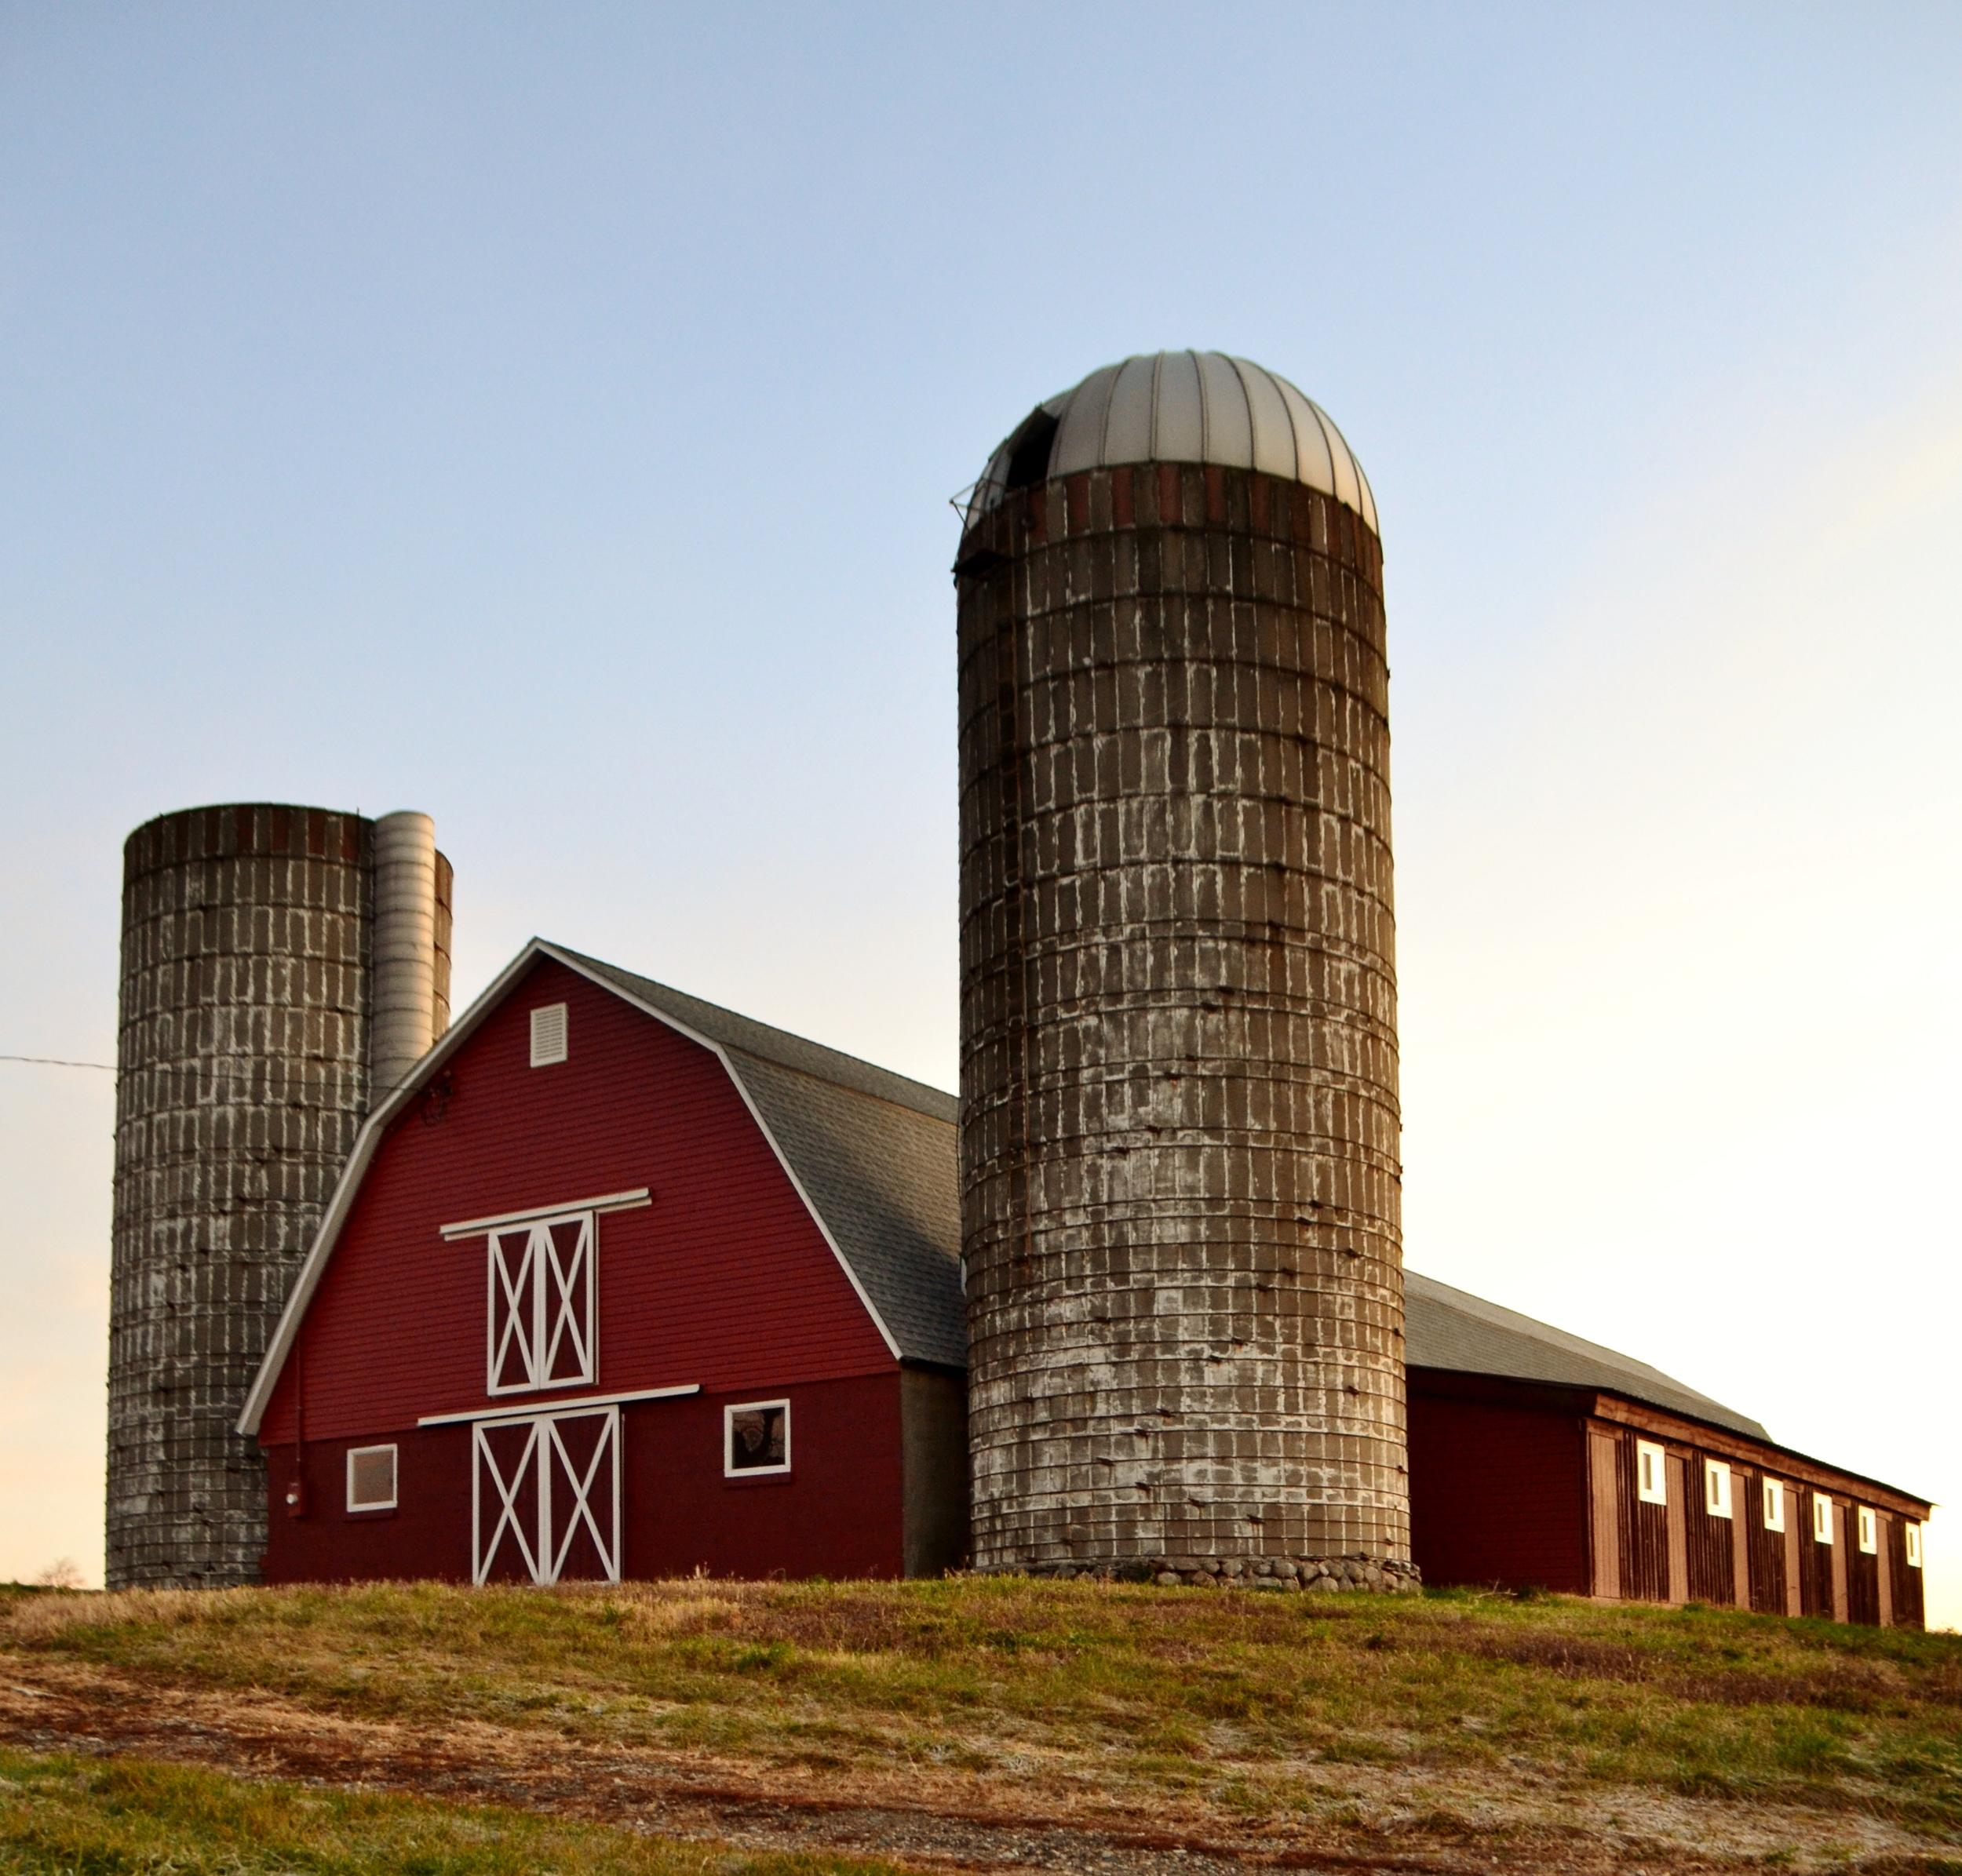 Nature View Farm in Bridgewater, CT